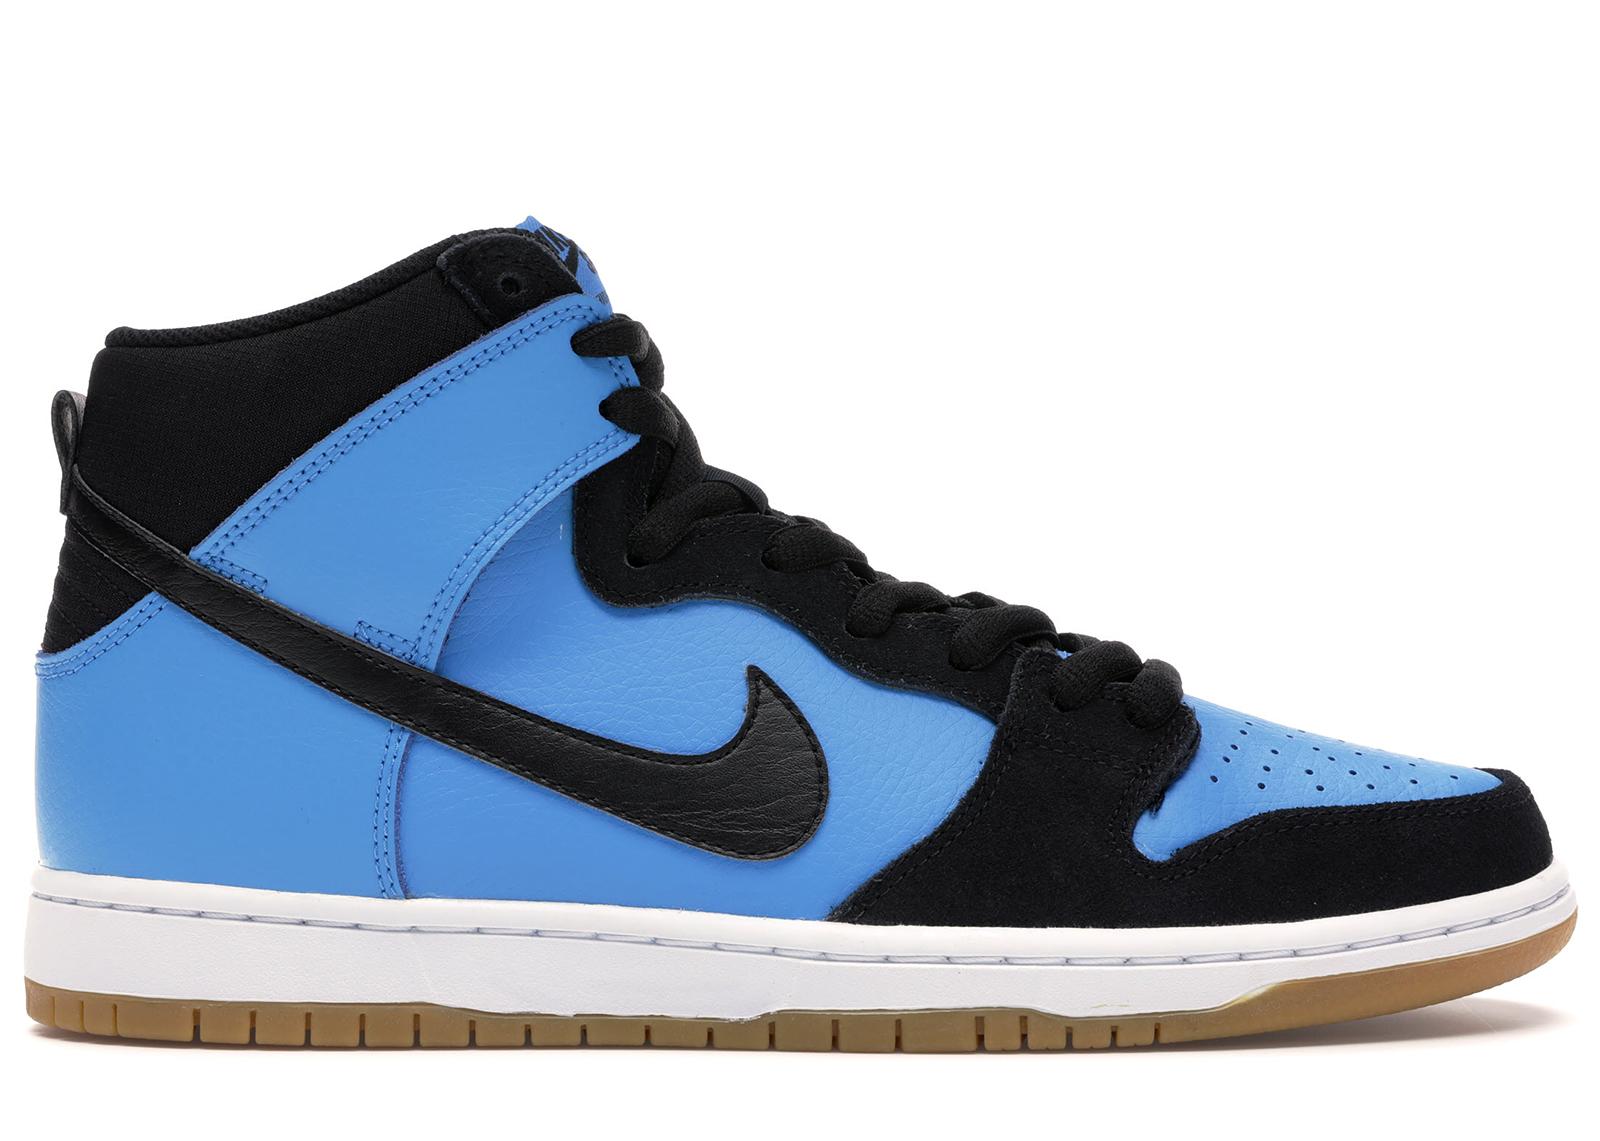 Nike Dunk SB High Blue Hero - 305050-470